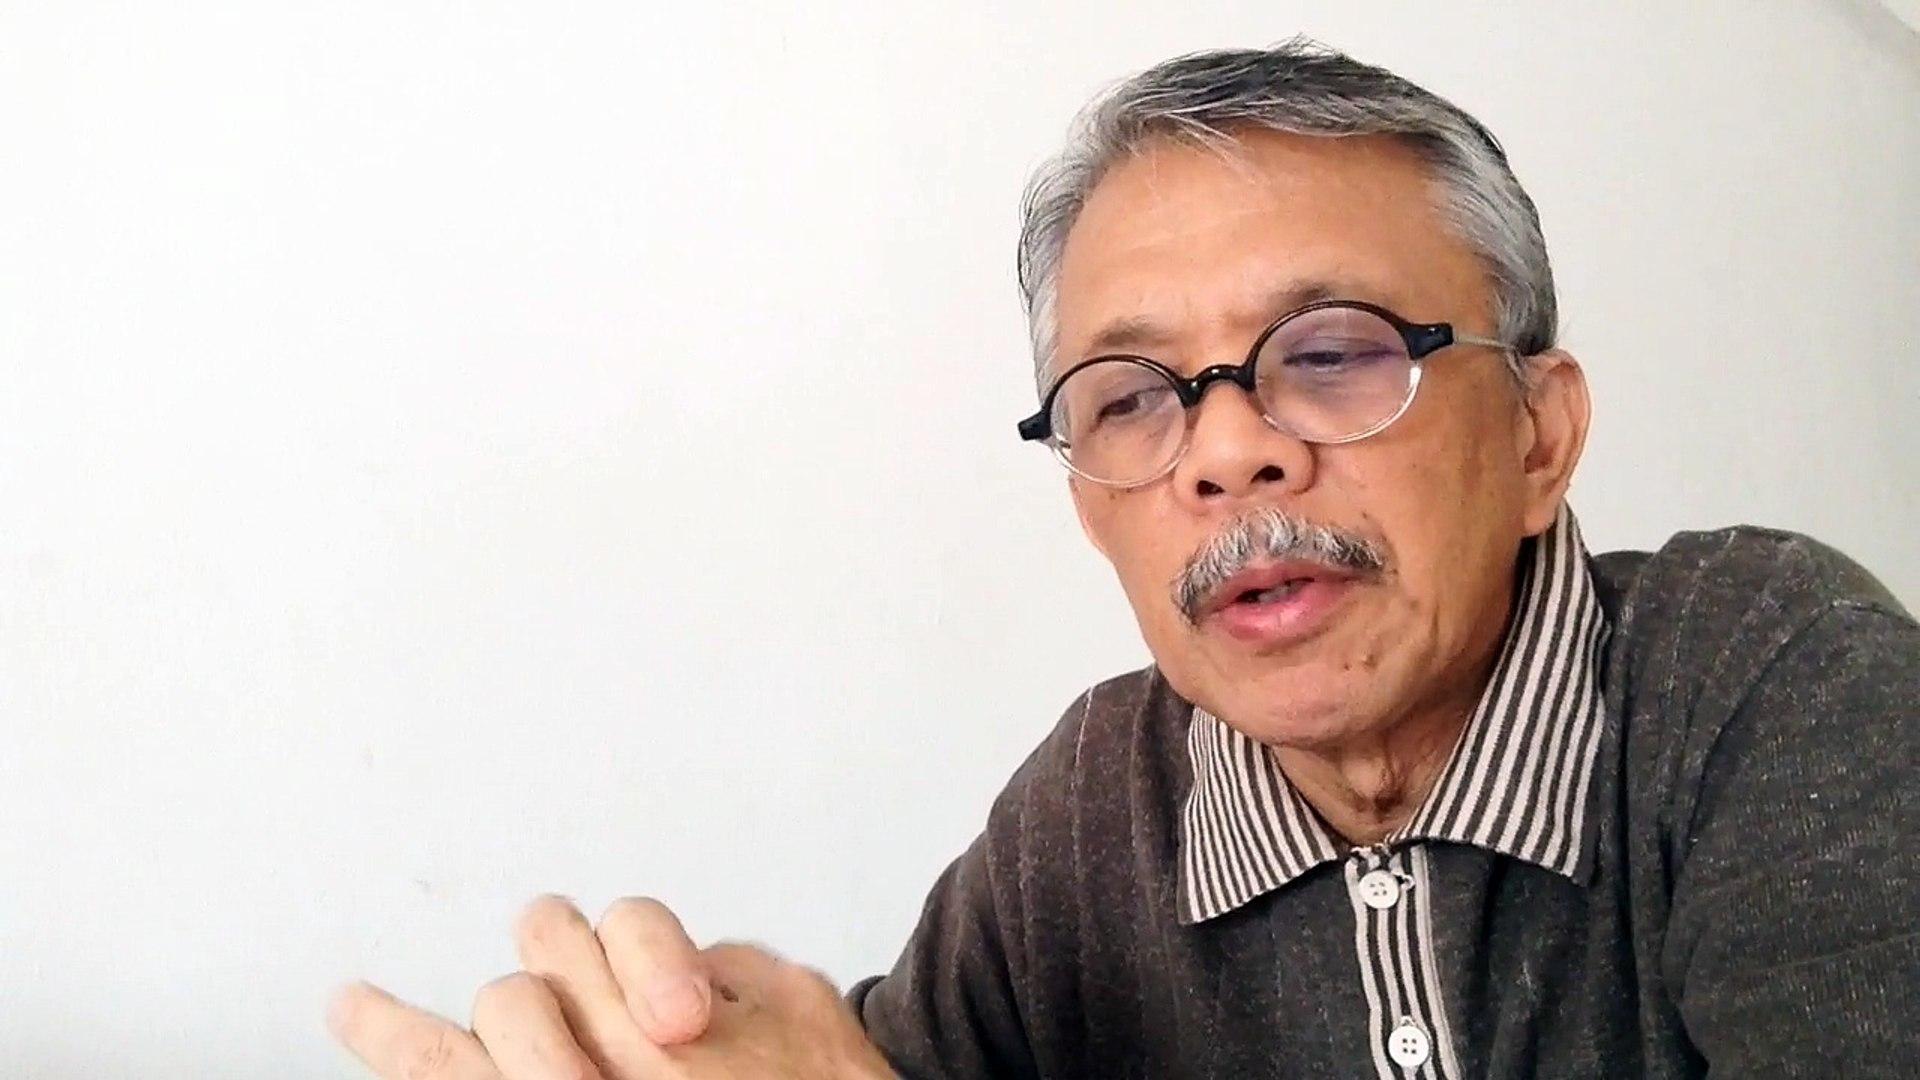 Religious leaders overzealous of their authorities